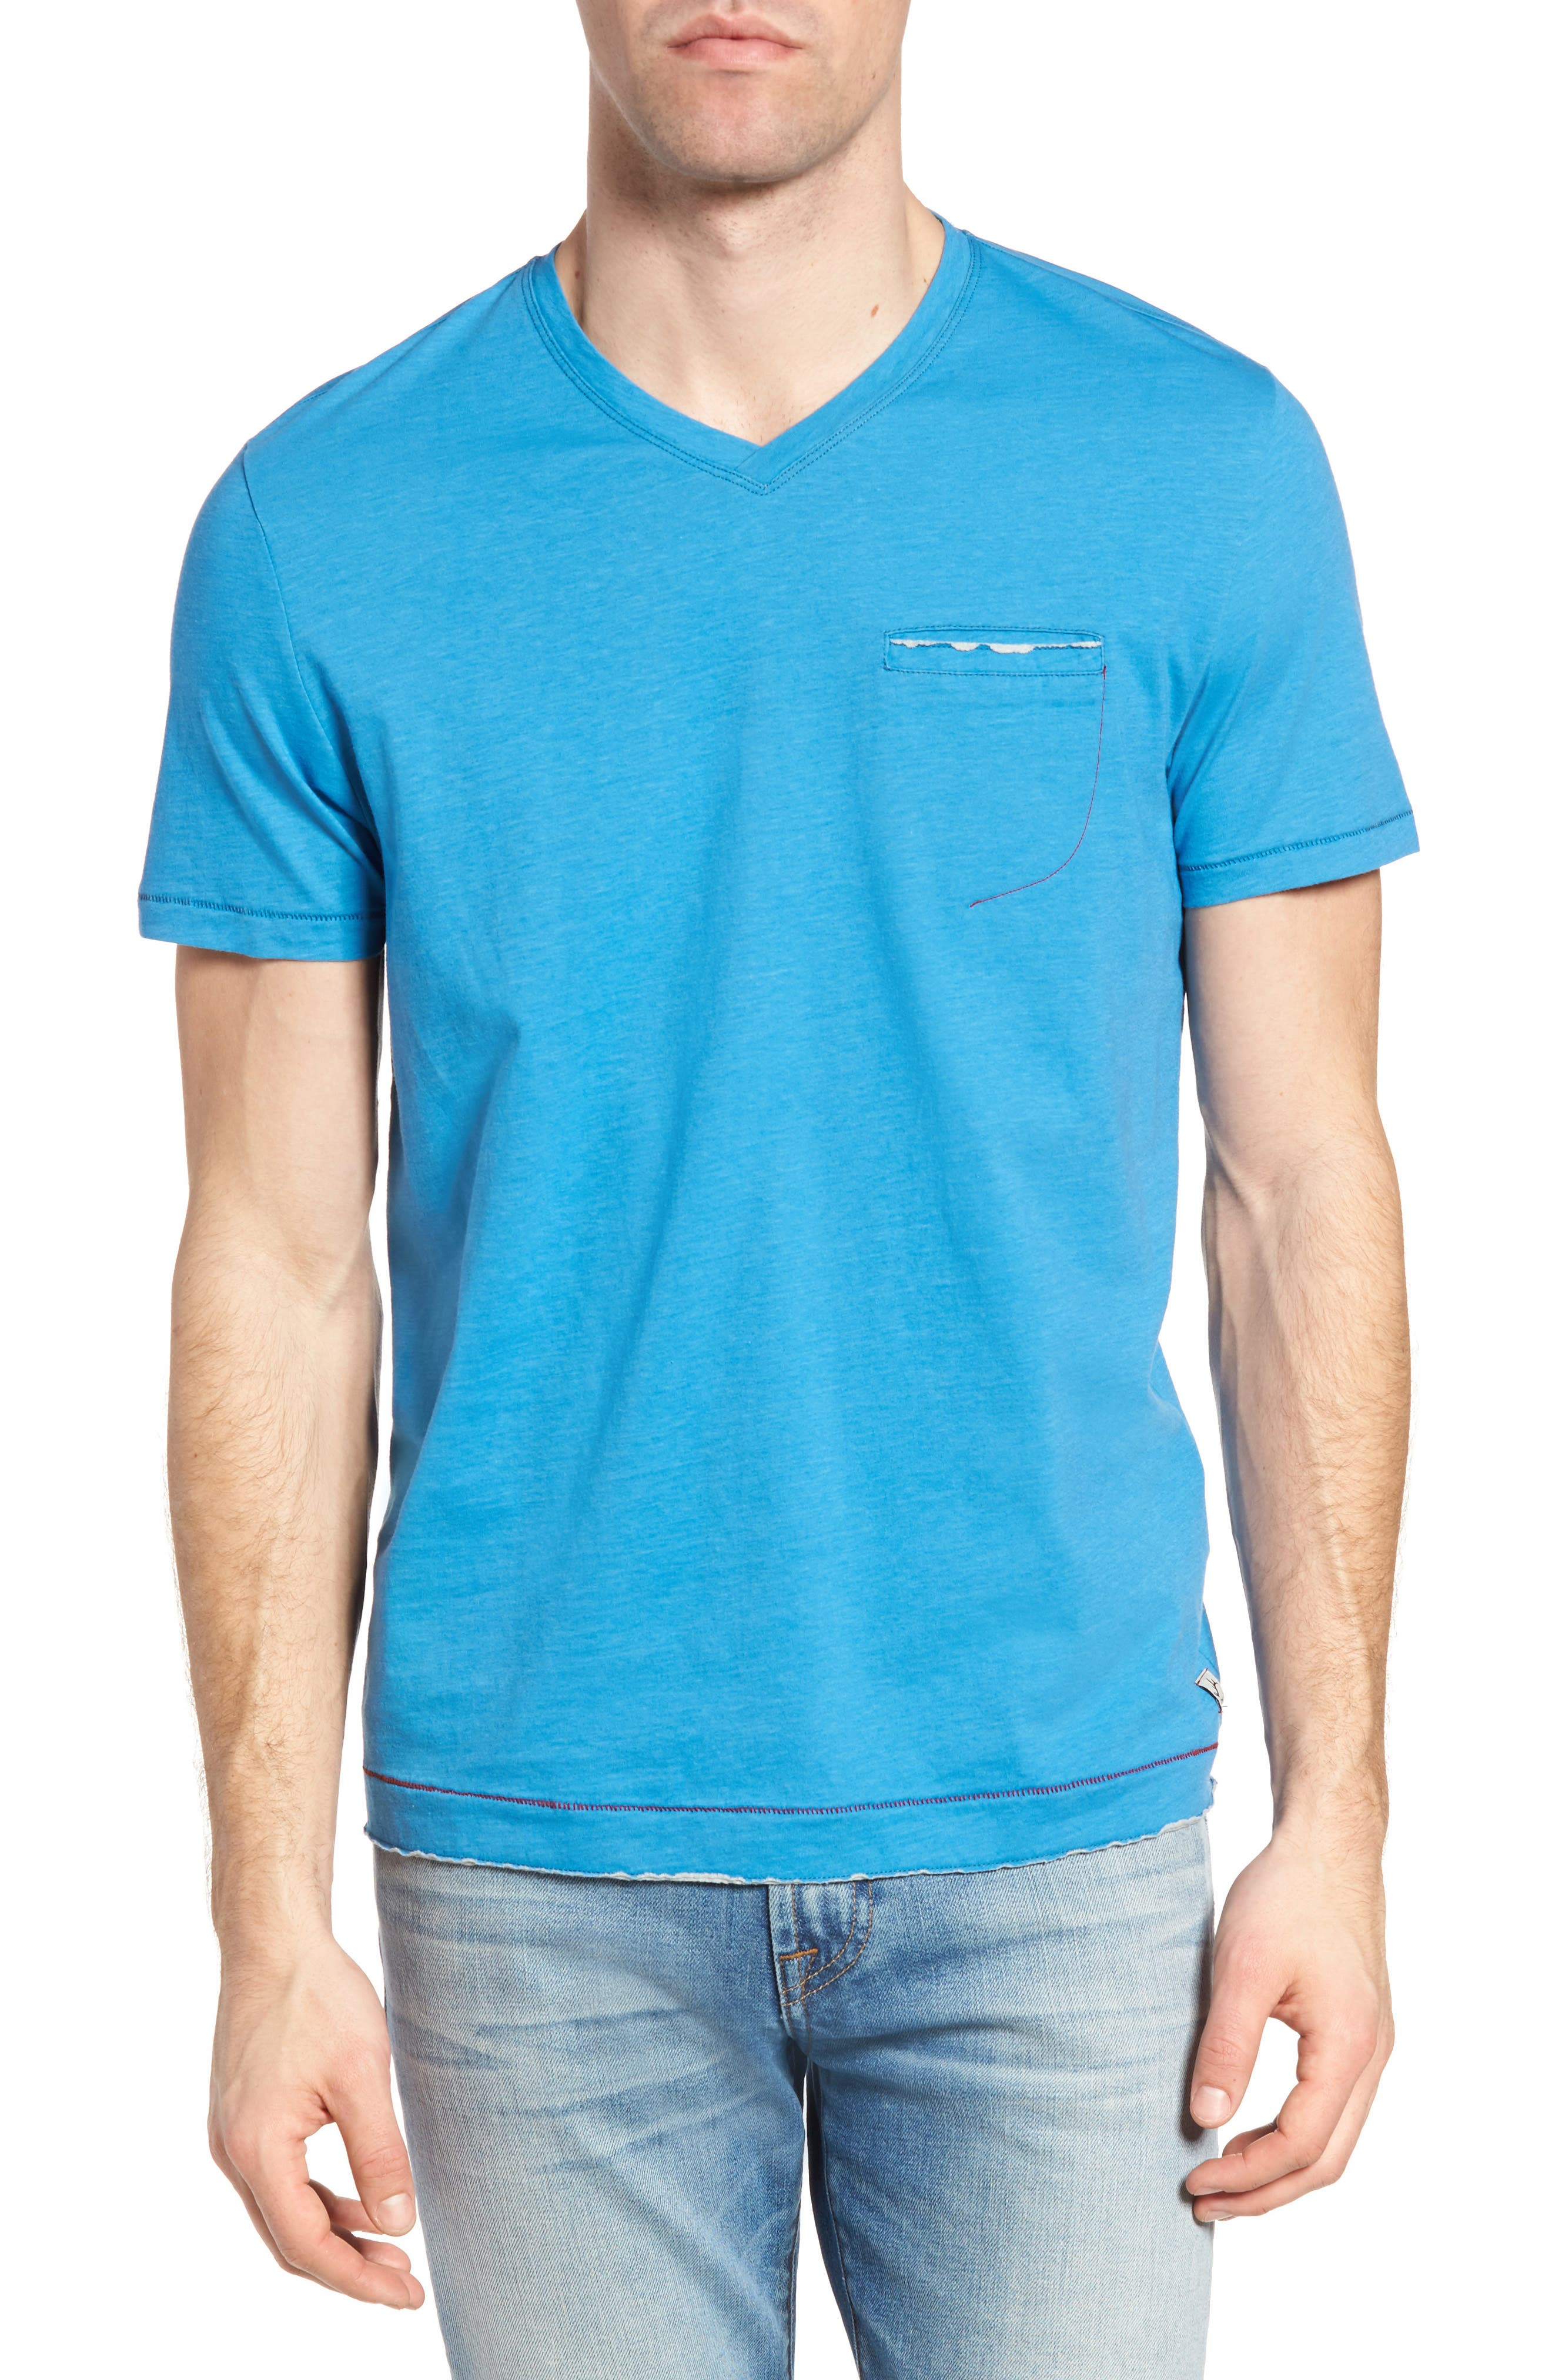 Jeremiah Gus Pad Pocket V-Neck T-Shirt